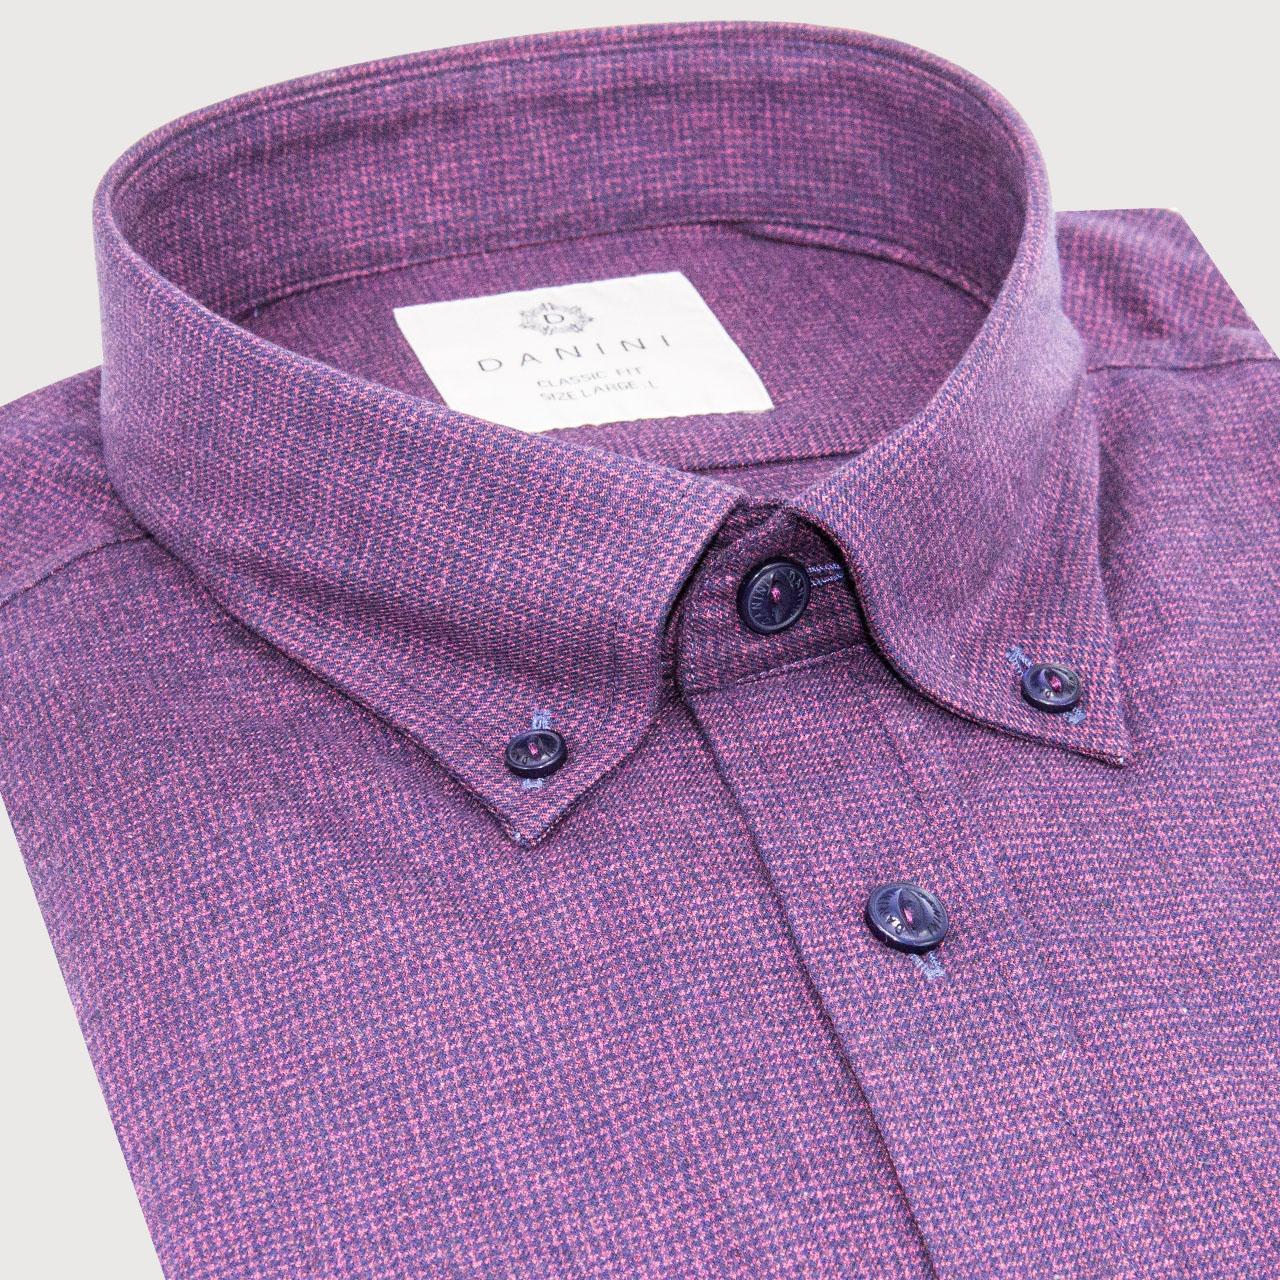 Collar Shirts Toronto